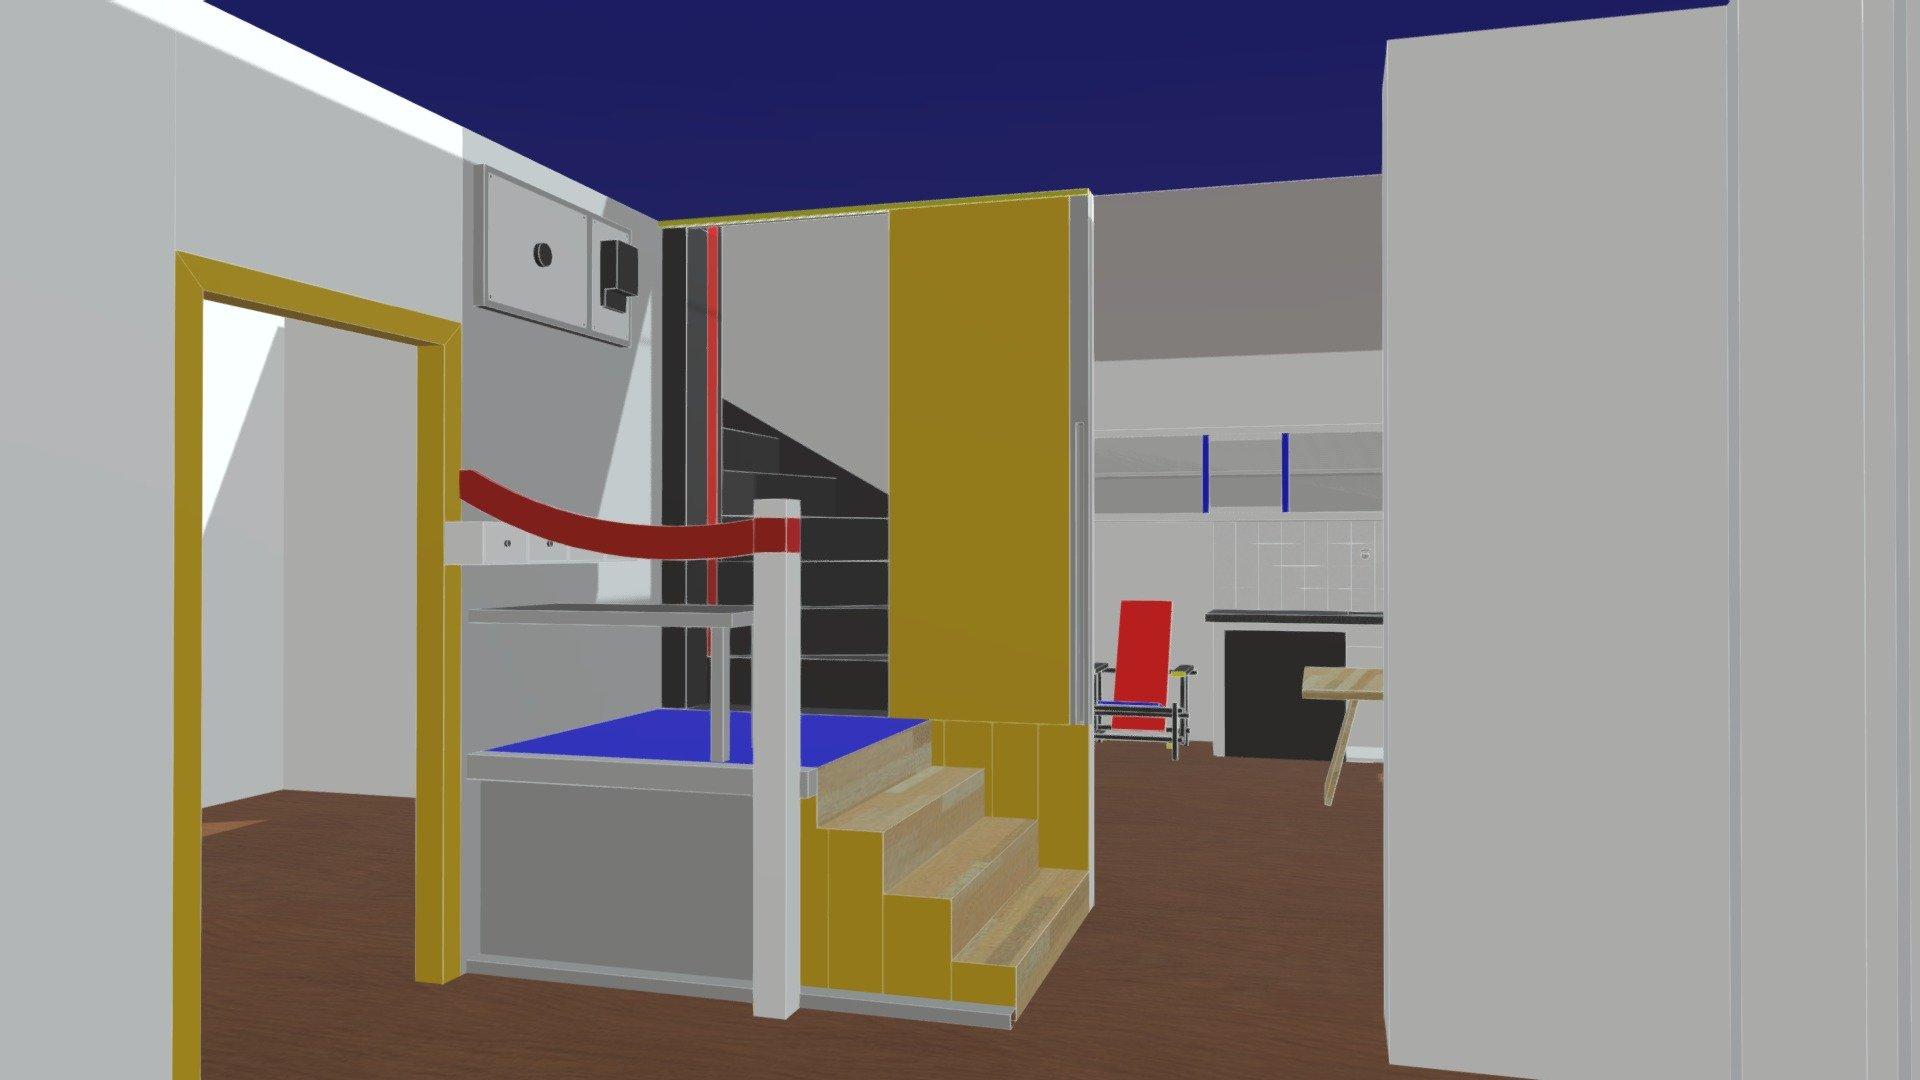 Schroder House Download Free 3D model by Kyle Linhardt